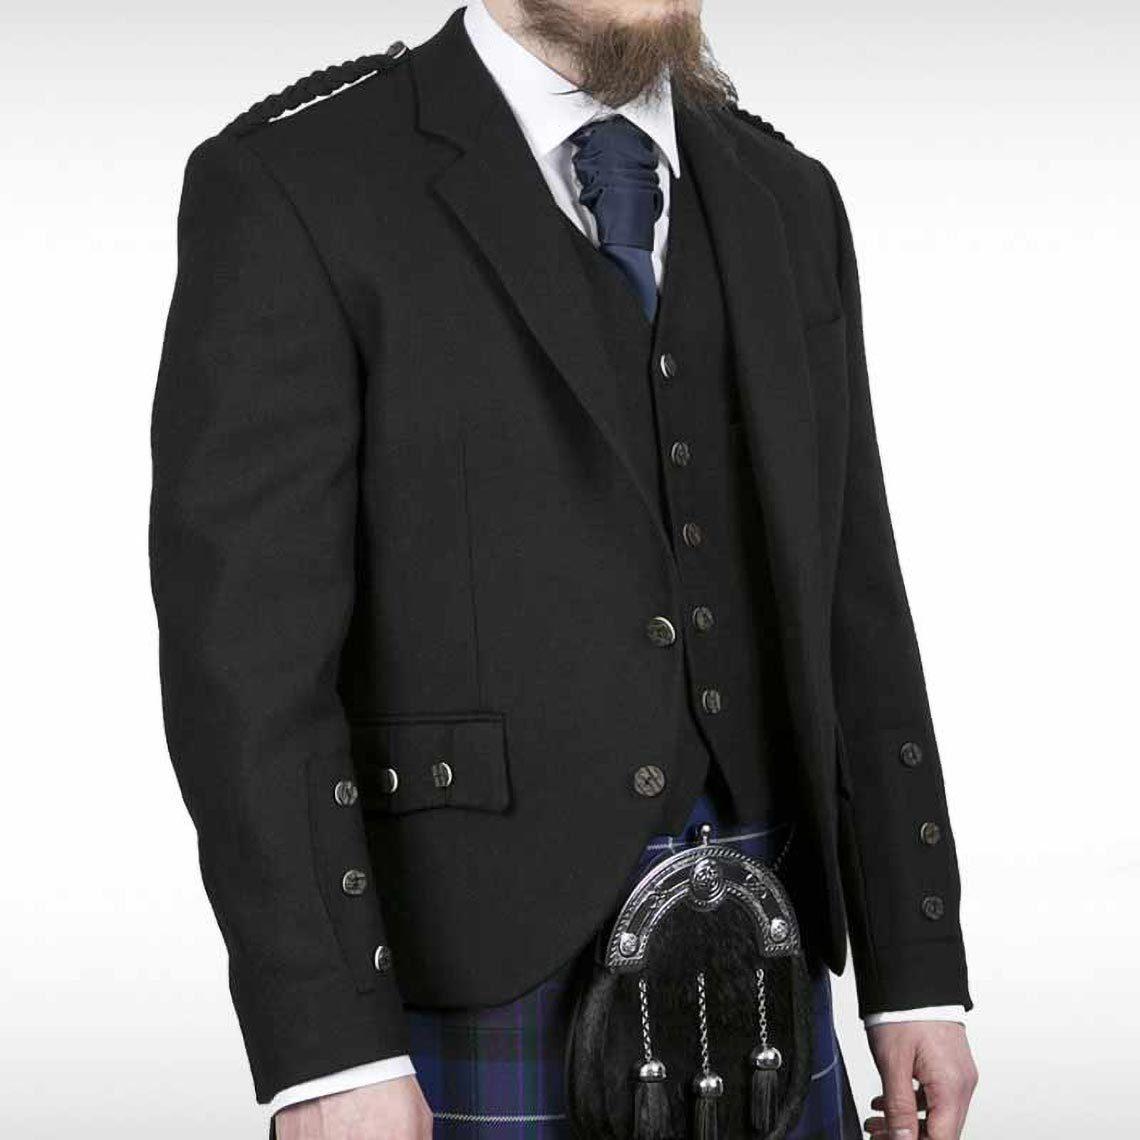 Black Crail Jacket & Waistcoat